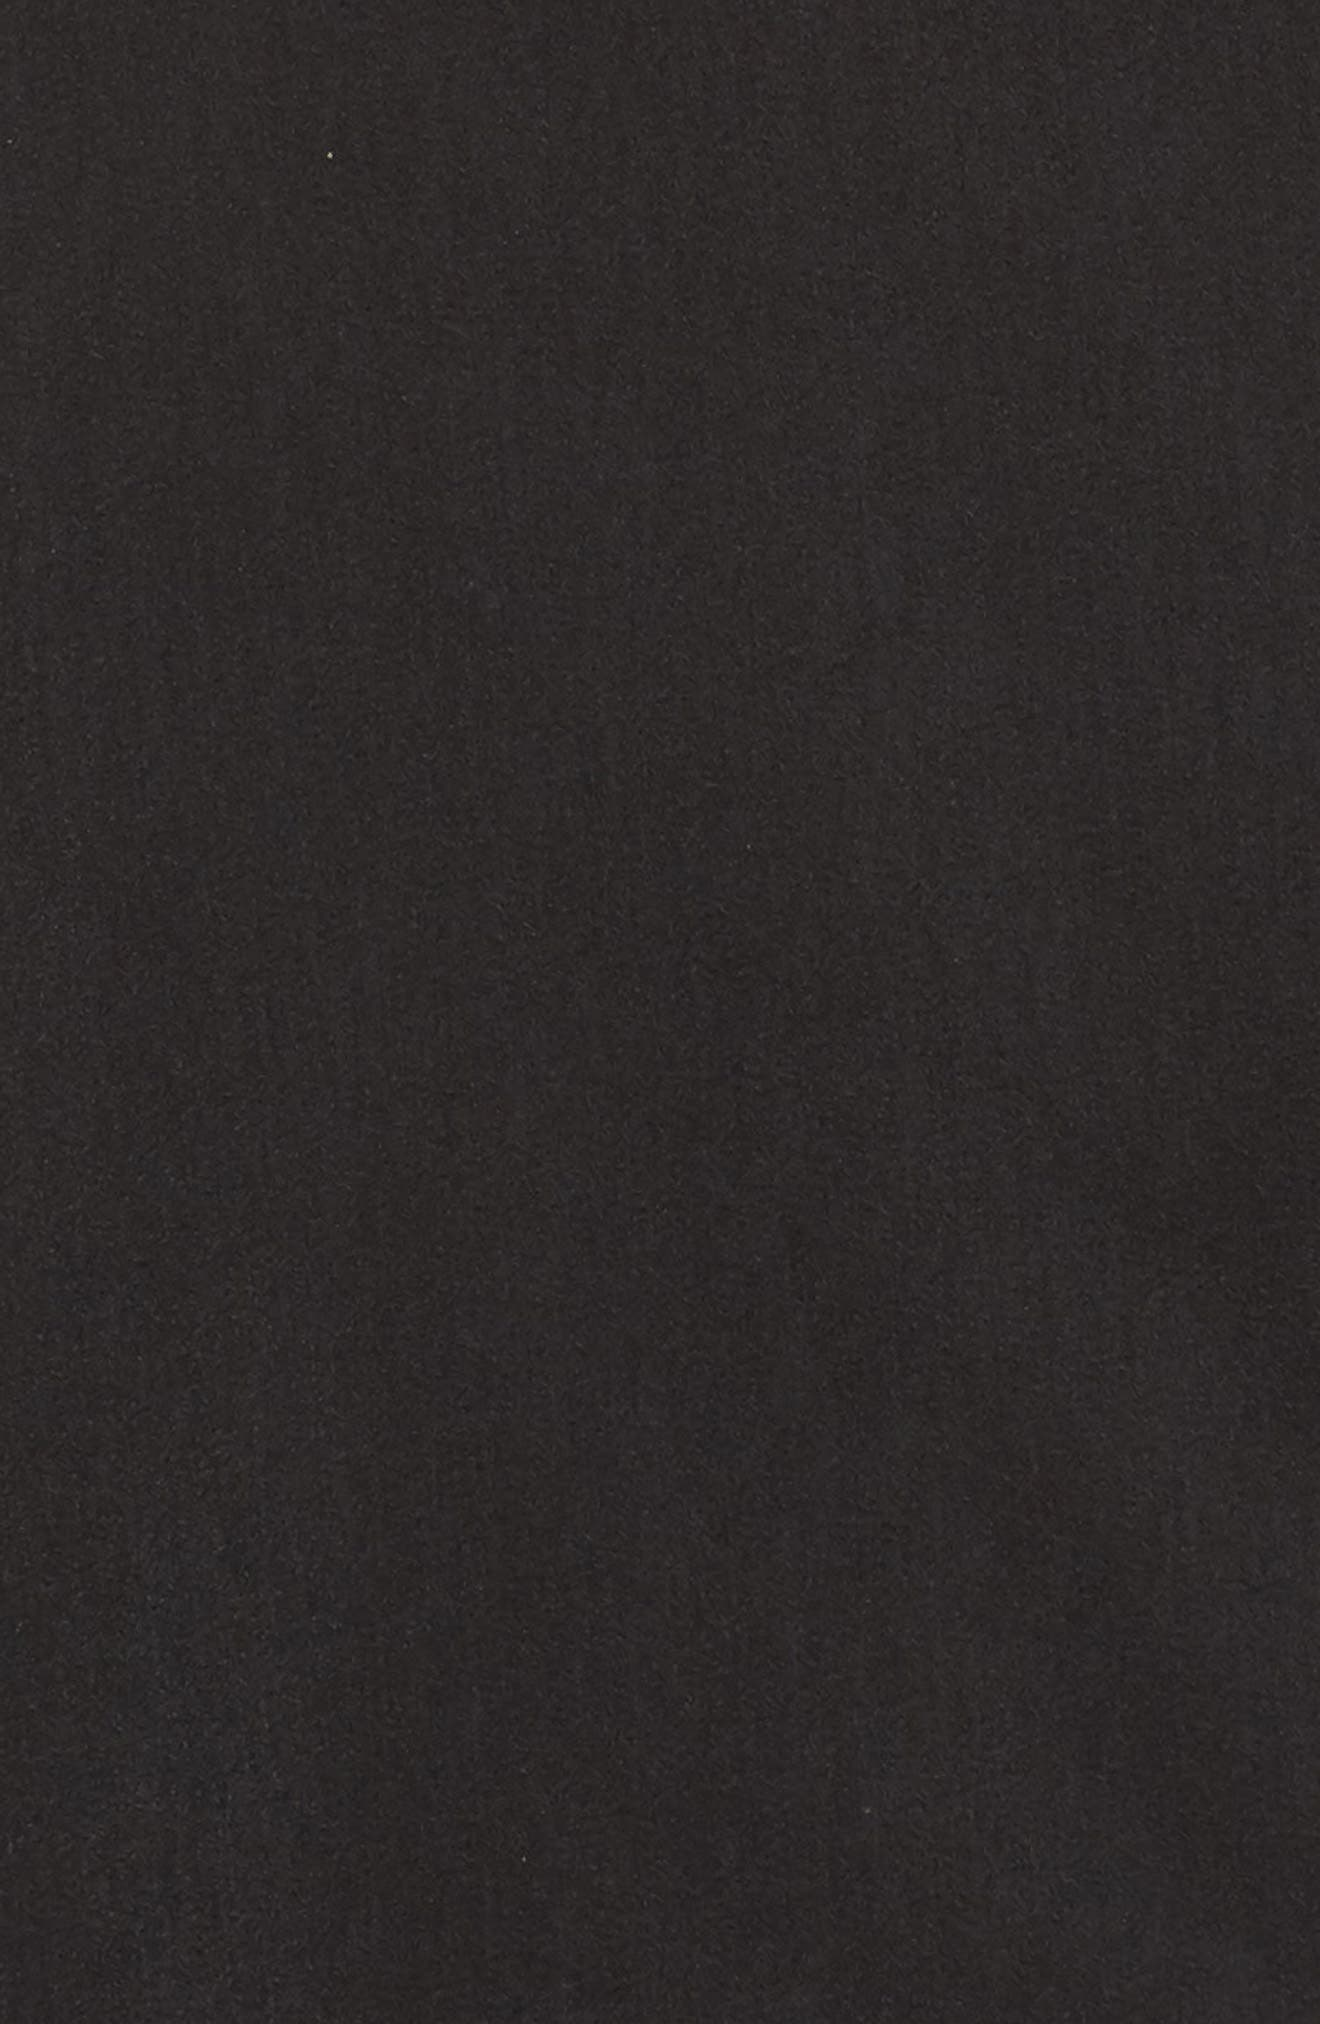 Kara Wrap Top & Shorts Set,                             Alternate thumbnail 5, color,                             001